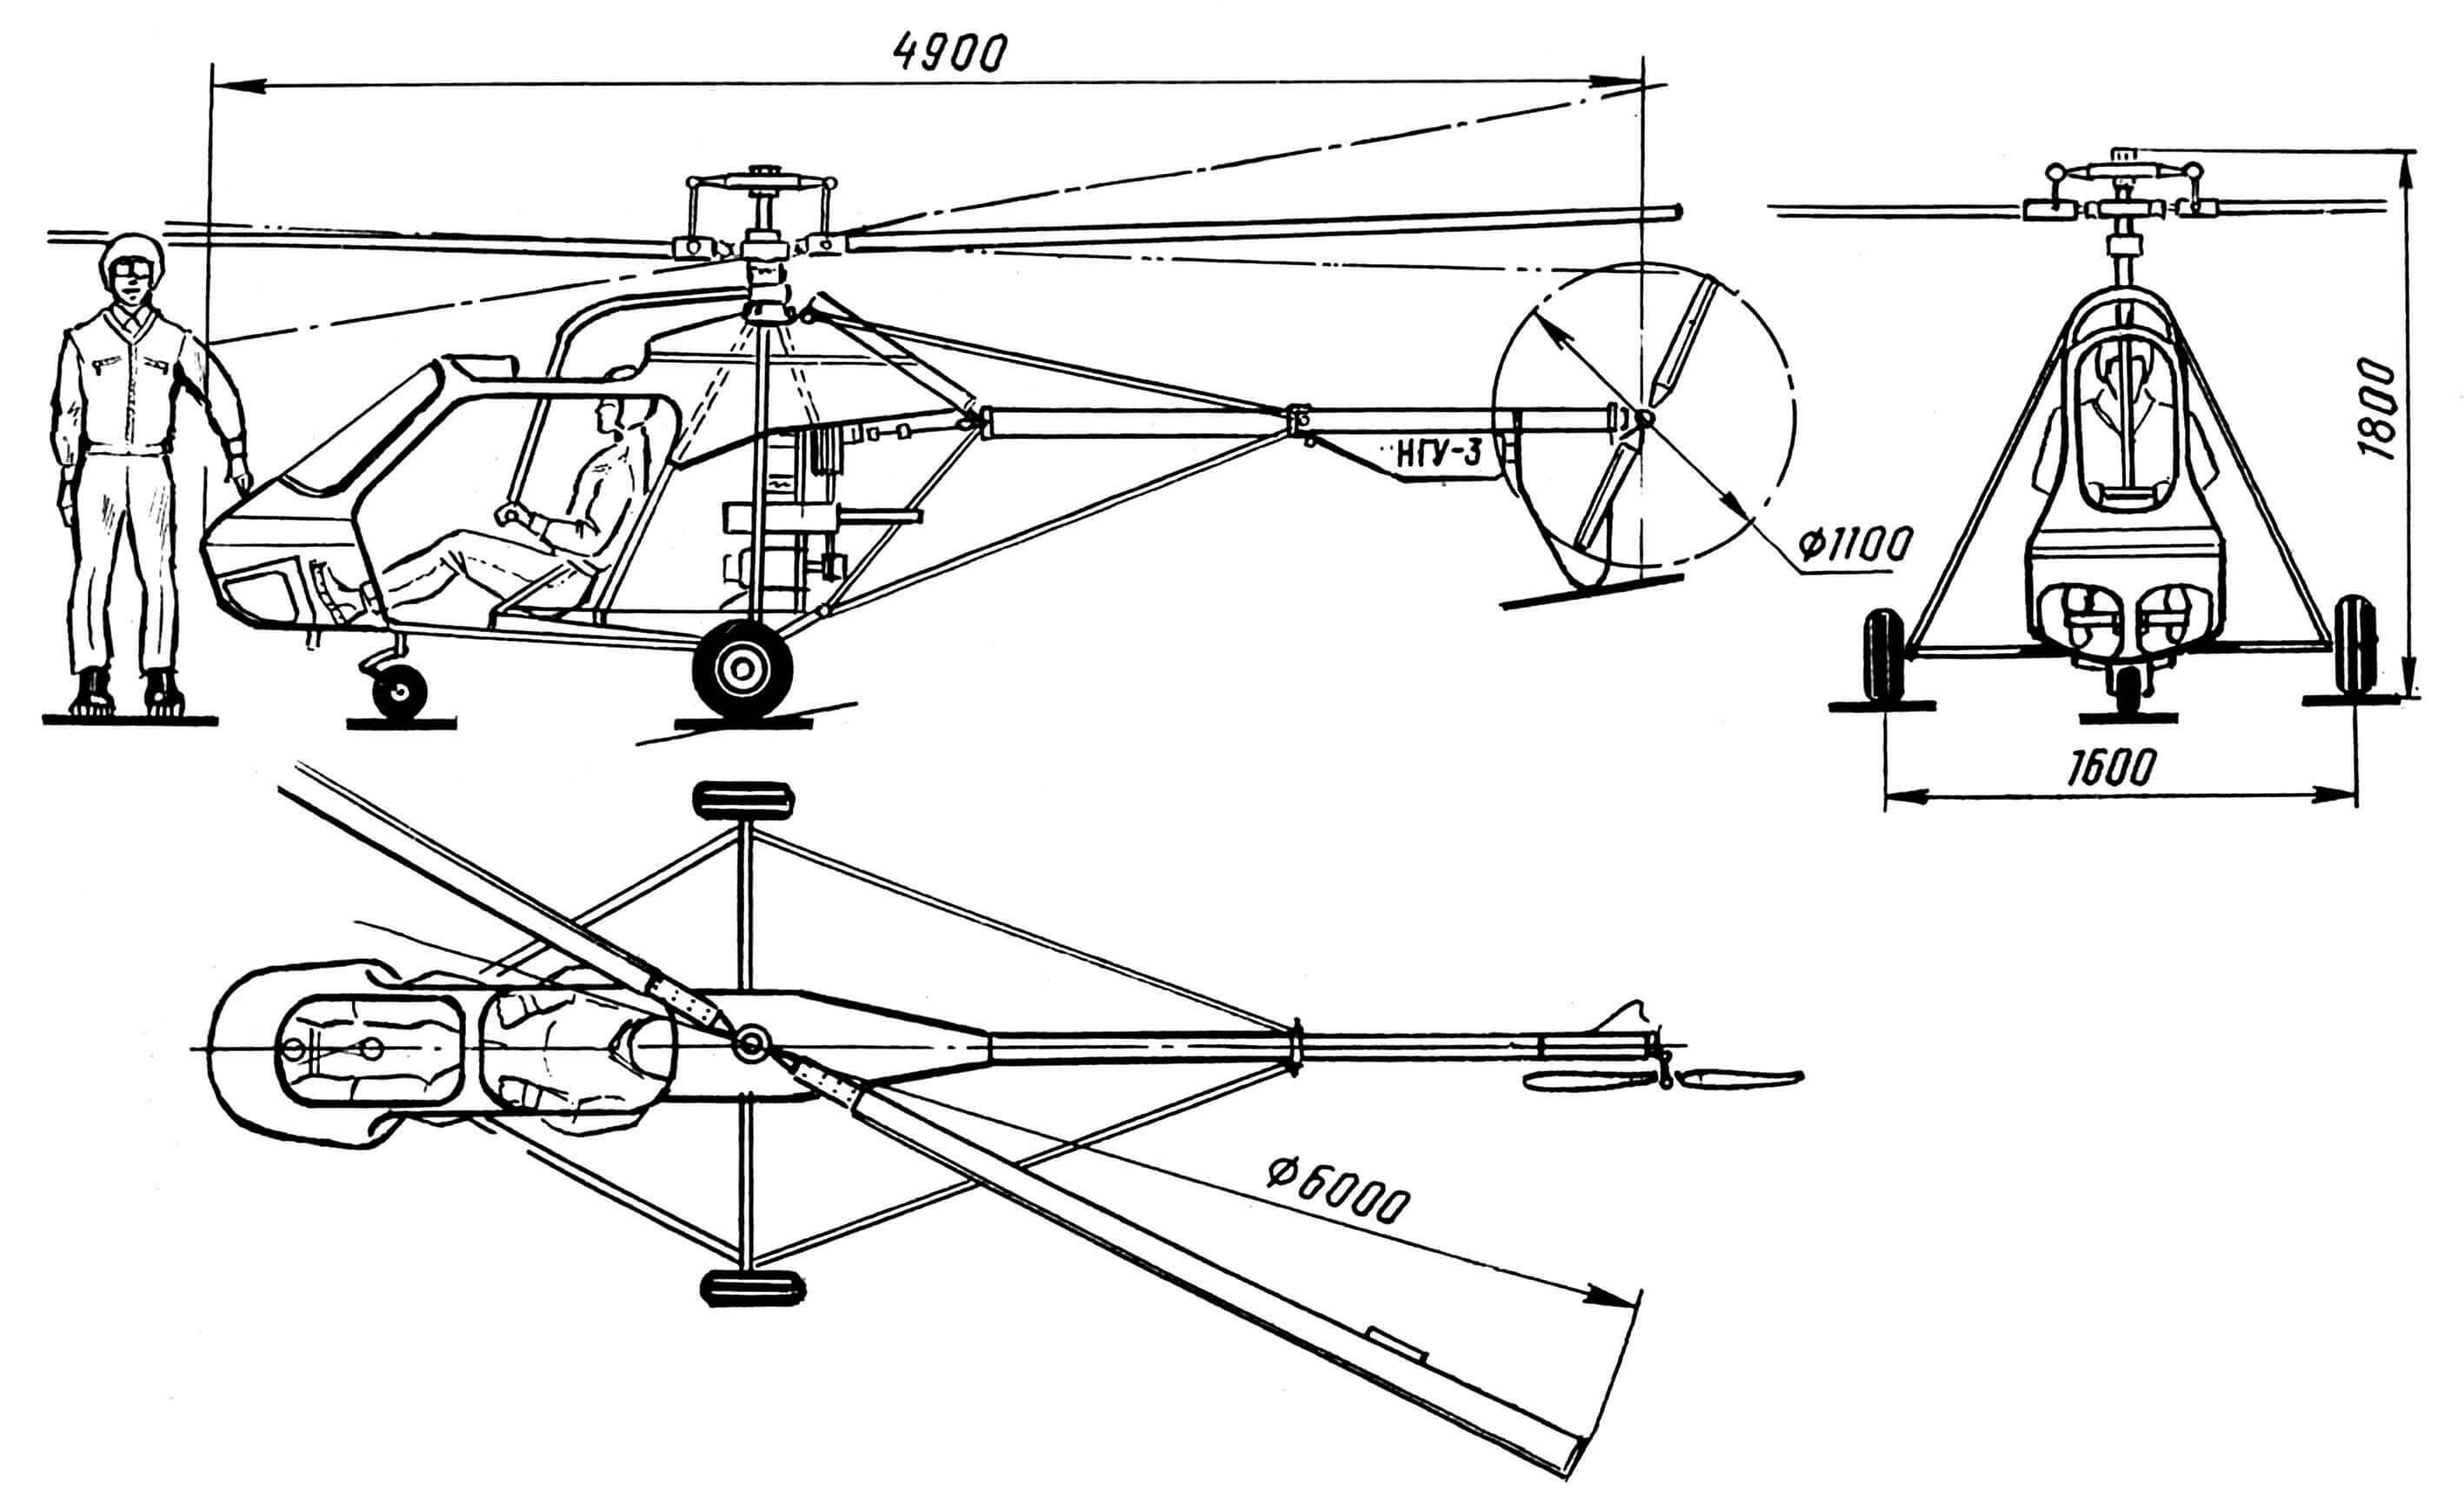 Рис. 1. Вертолет-тренажер НГУ-3.